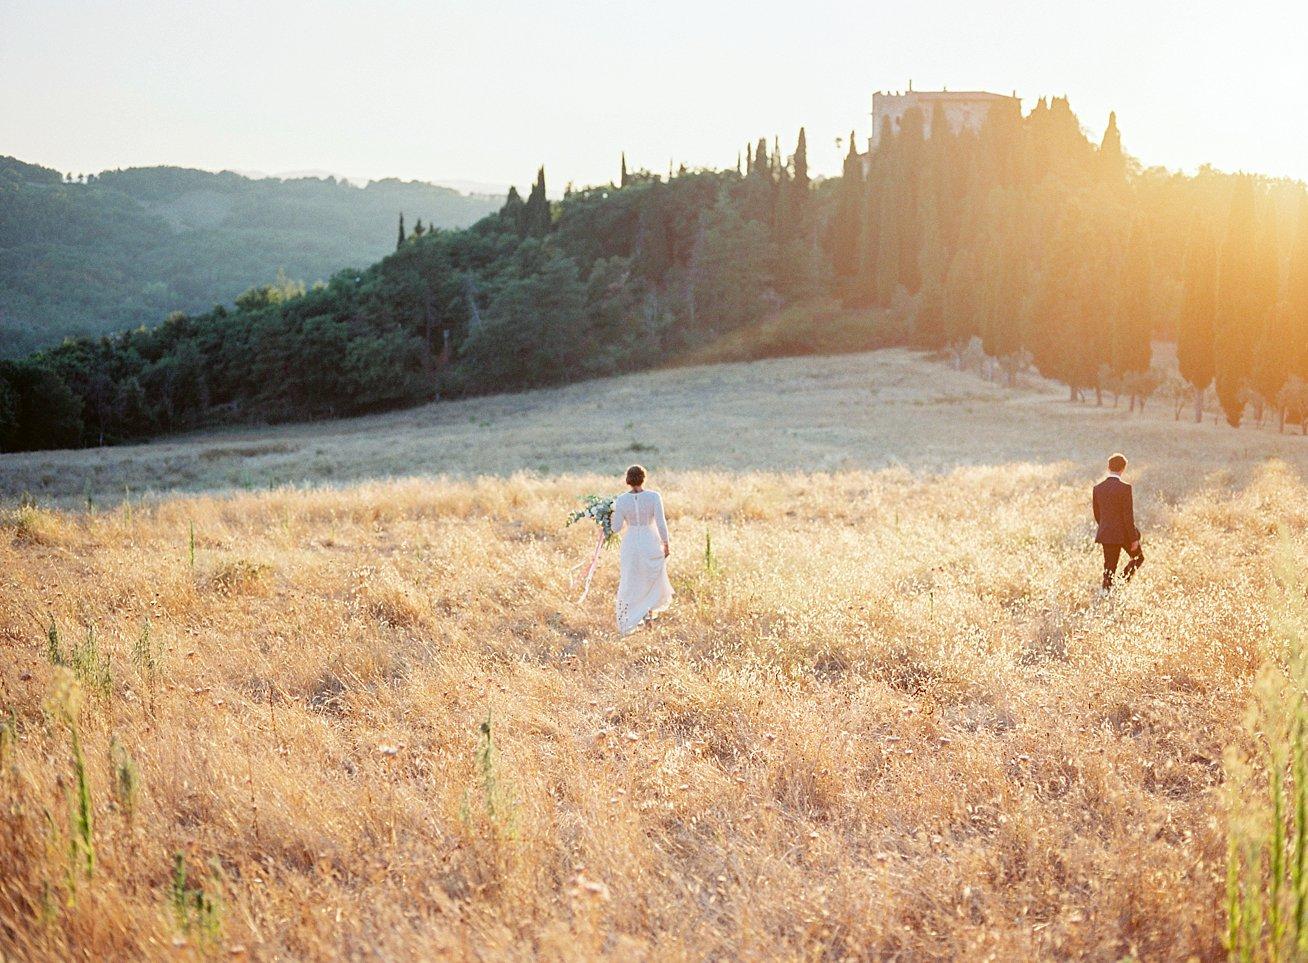 Amanda-Drost-Fotografie-Bruioft-Italie-Trouwen-buitenland-destination-wedding-italy_0069.jpg